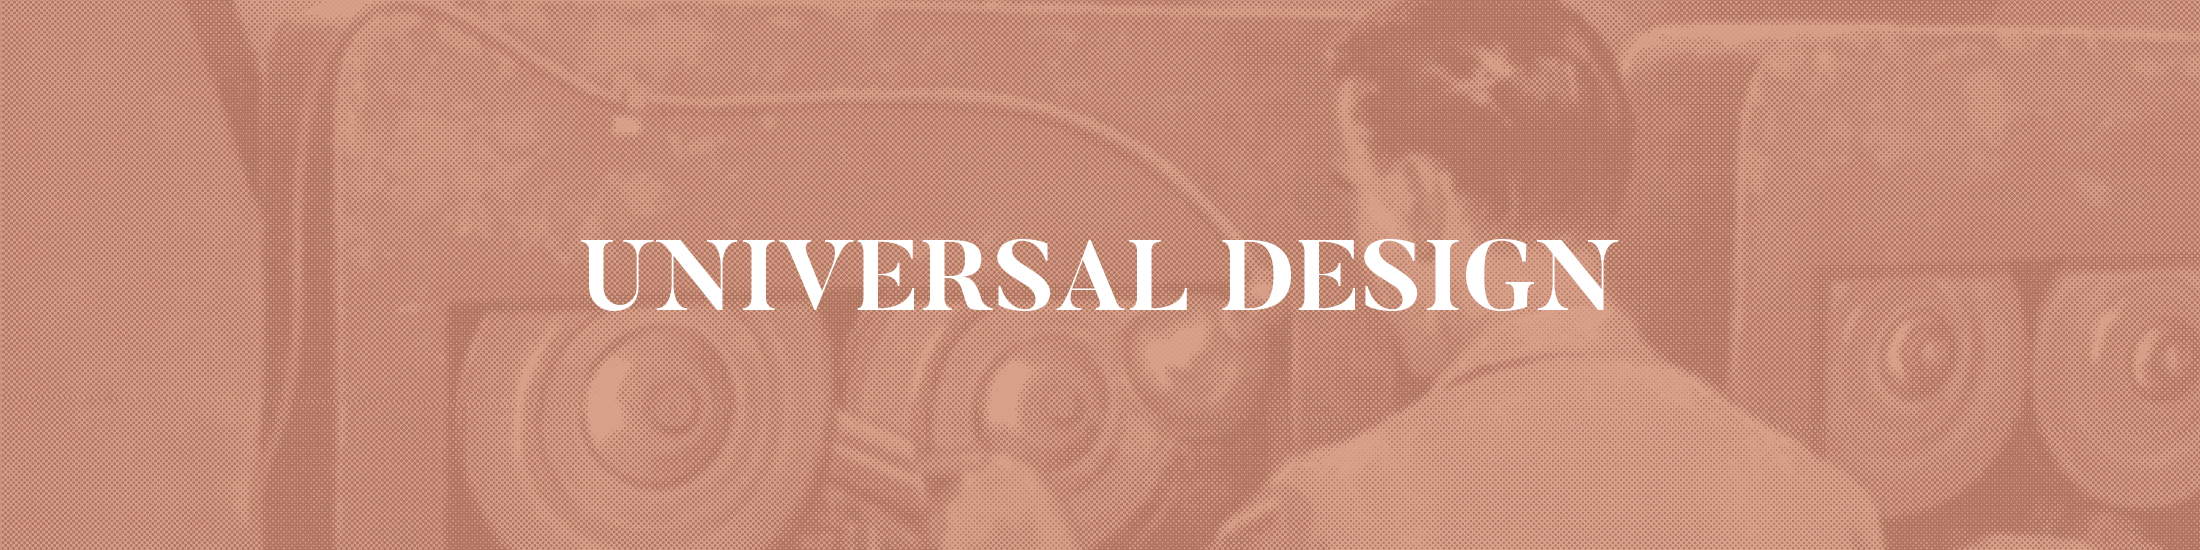 Universal Design digital exhibit